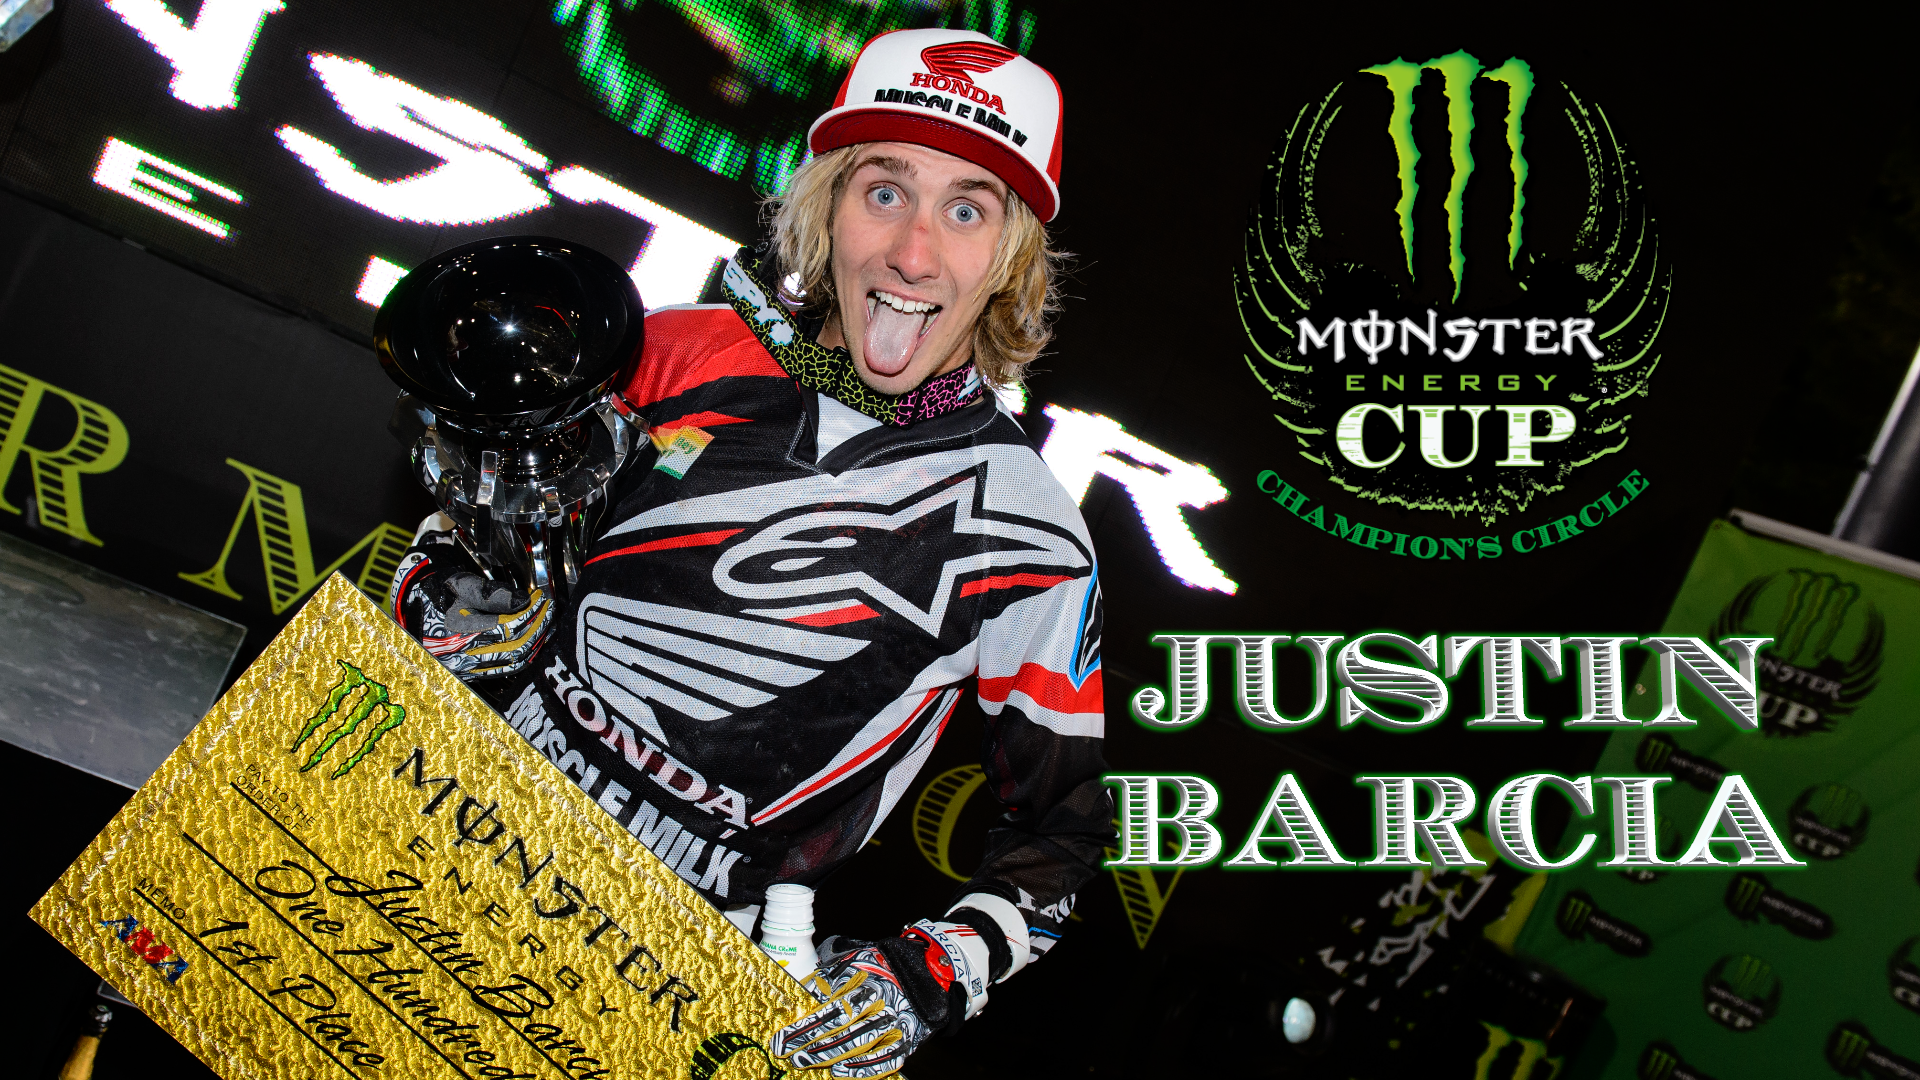 2019 Monster Energy Supercross Schedule | Supercross Live